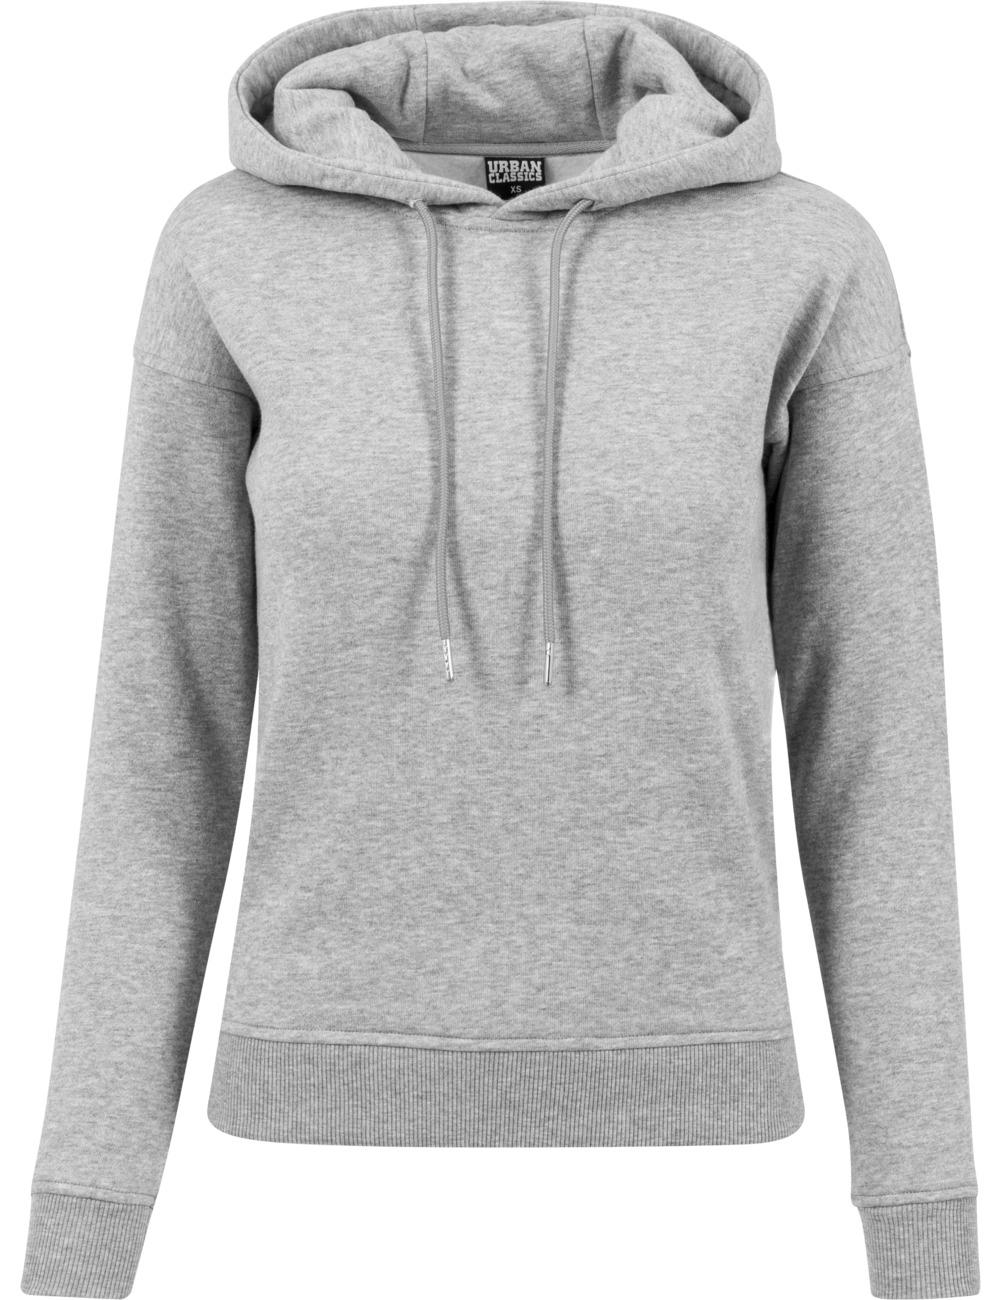 urban-classics-damen-sweater-hoody